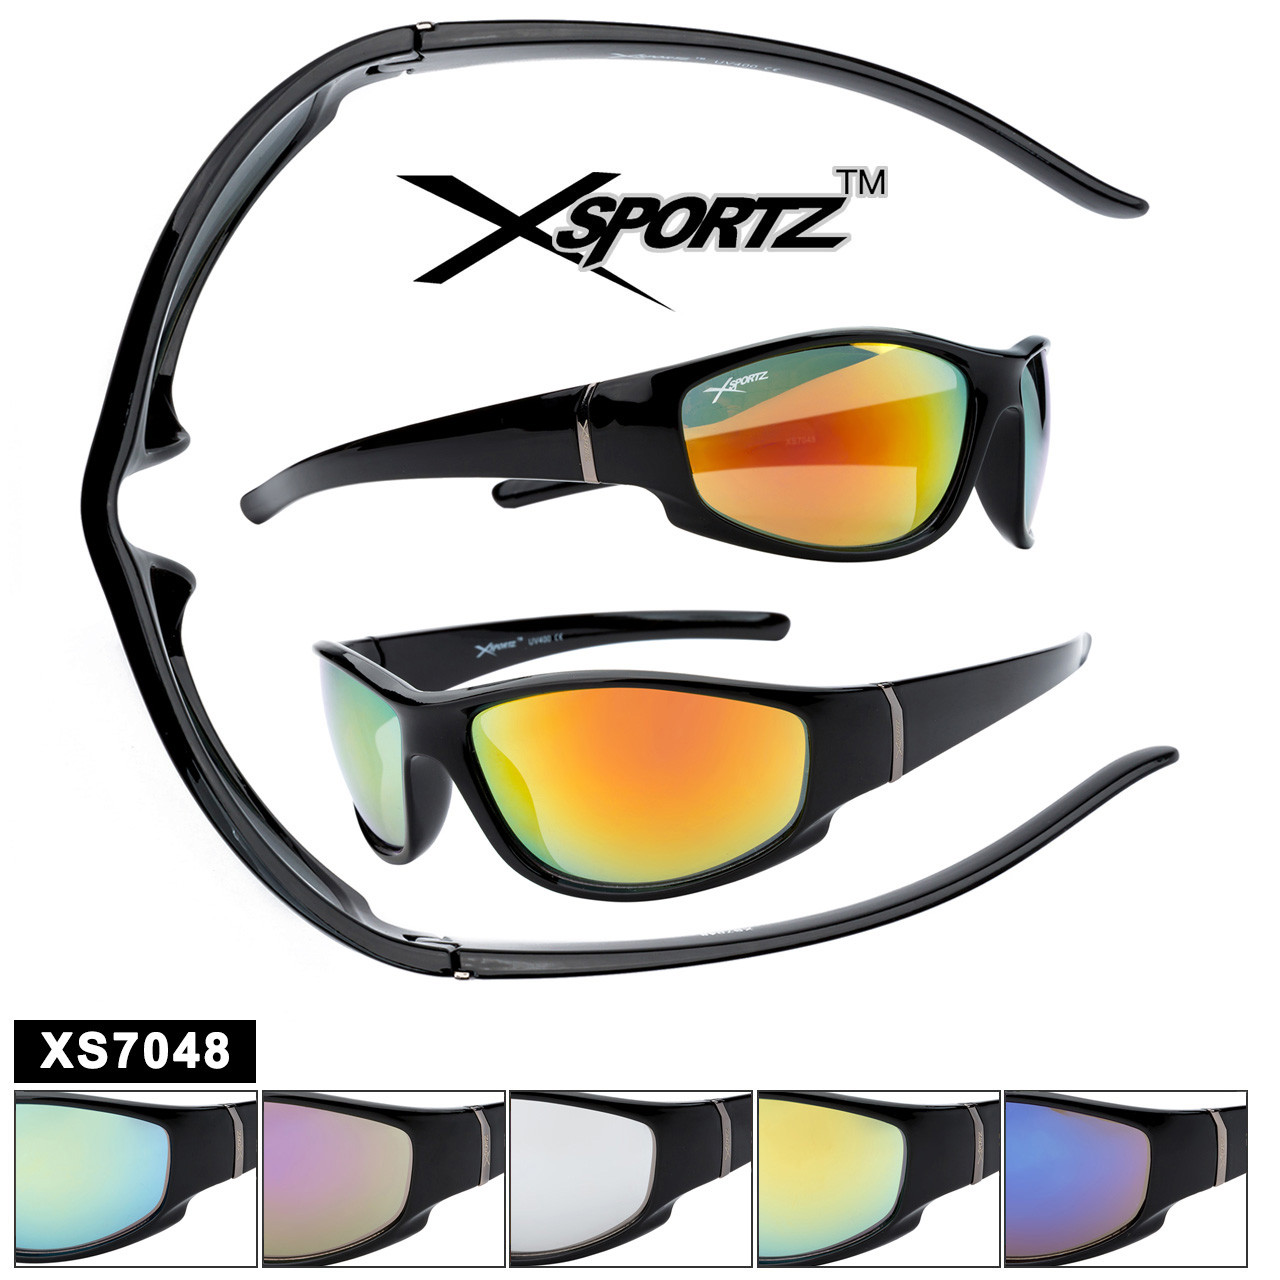 Bulk Xsportz™ Sports Sunglasses XS7048